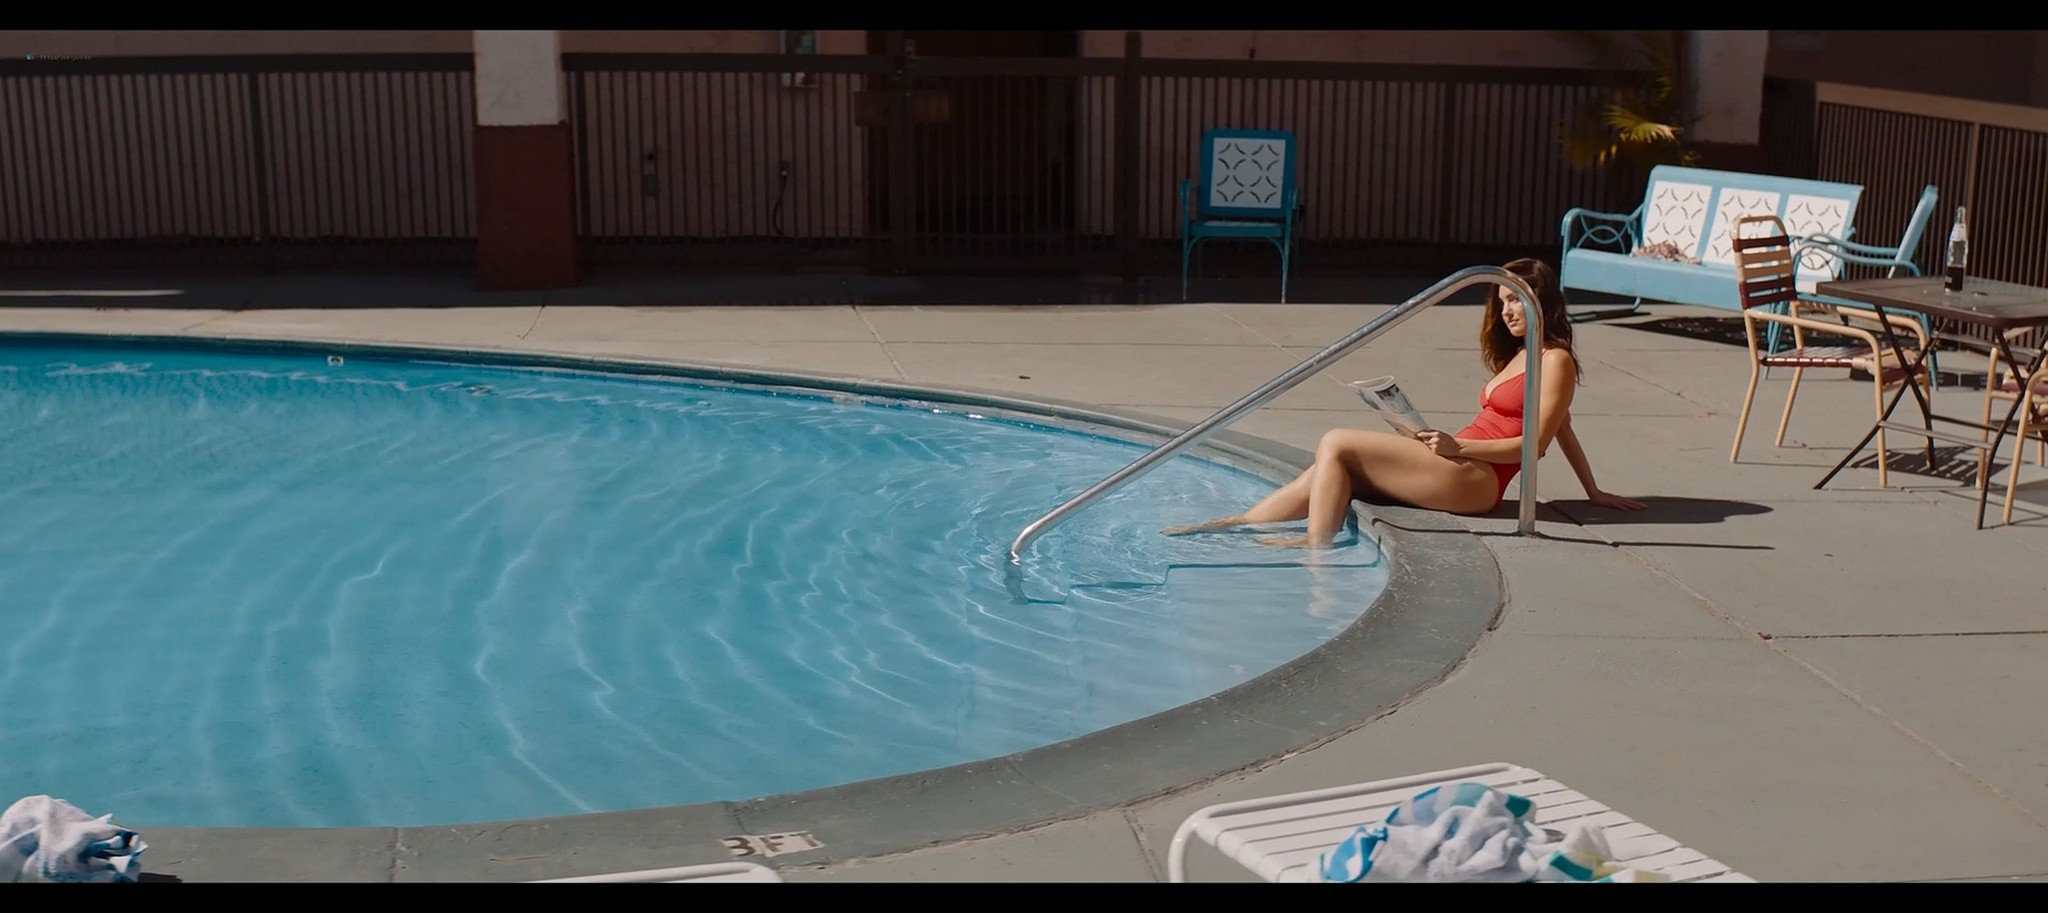 Minka Kelly hot in a swimsuit AnnaSophia Robb sexy Lansky 2021 1080p Web 2